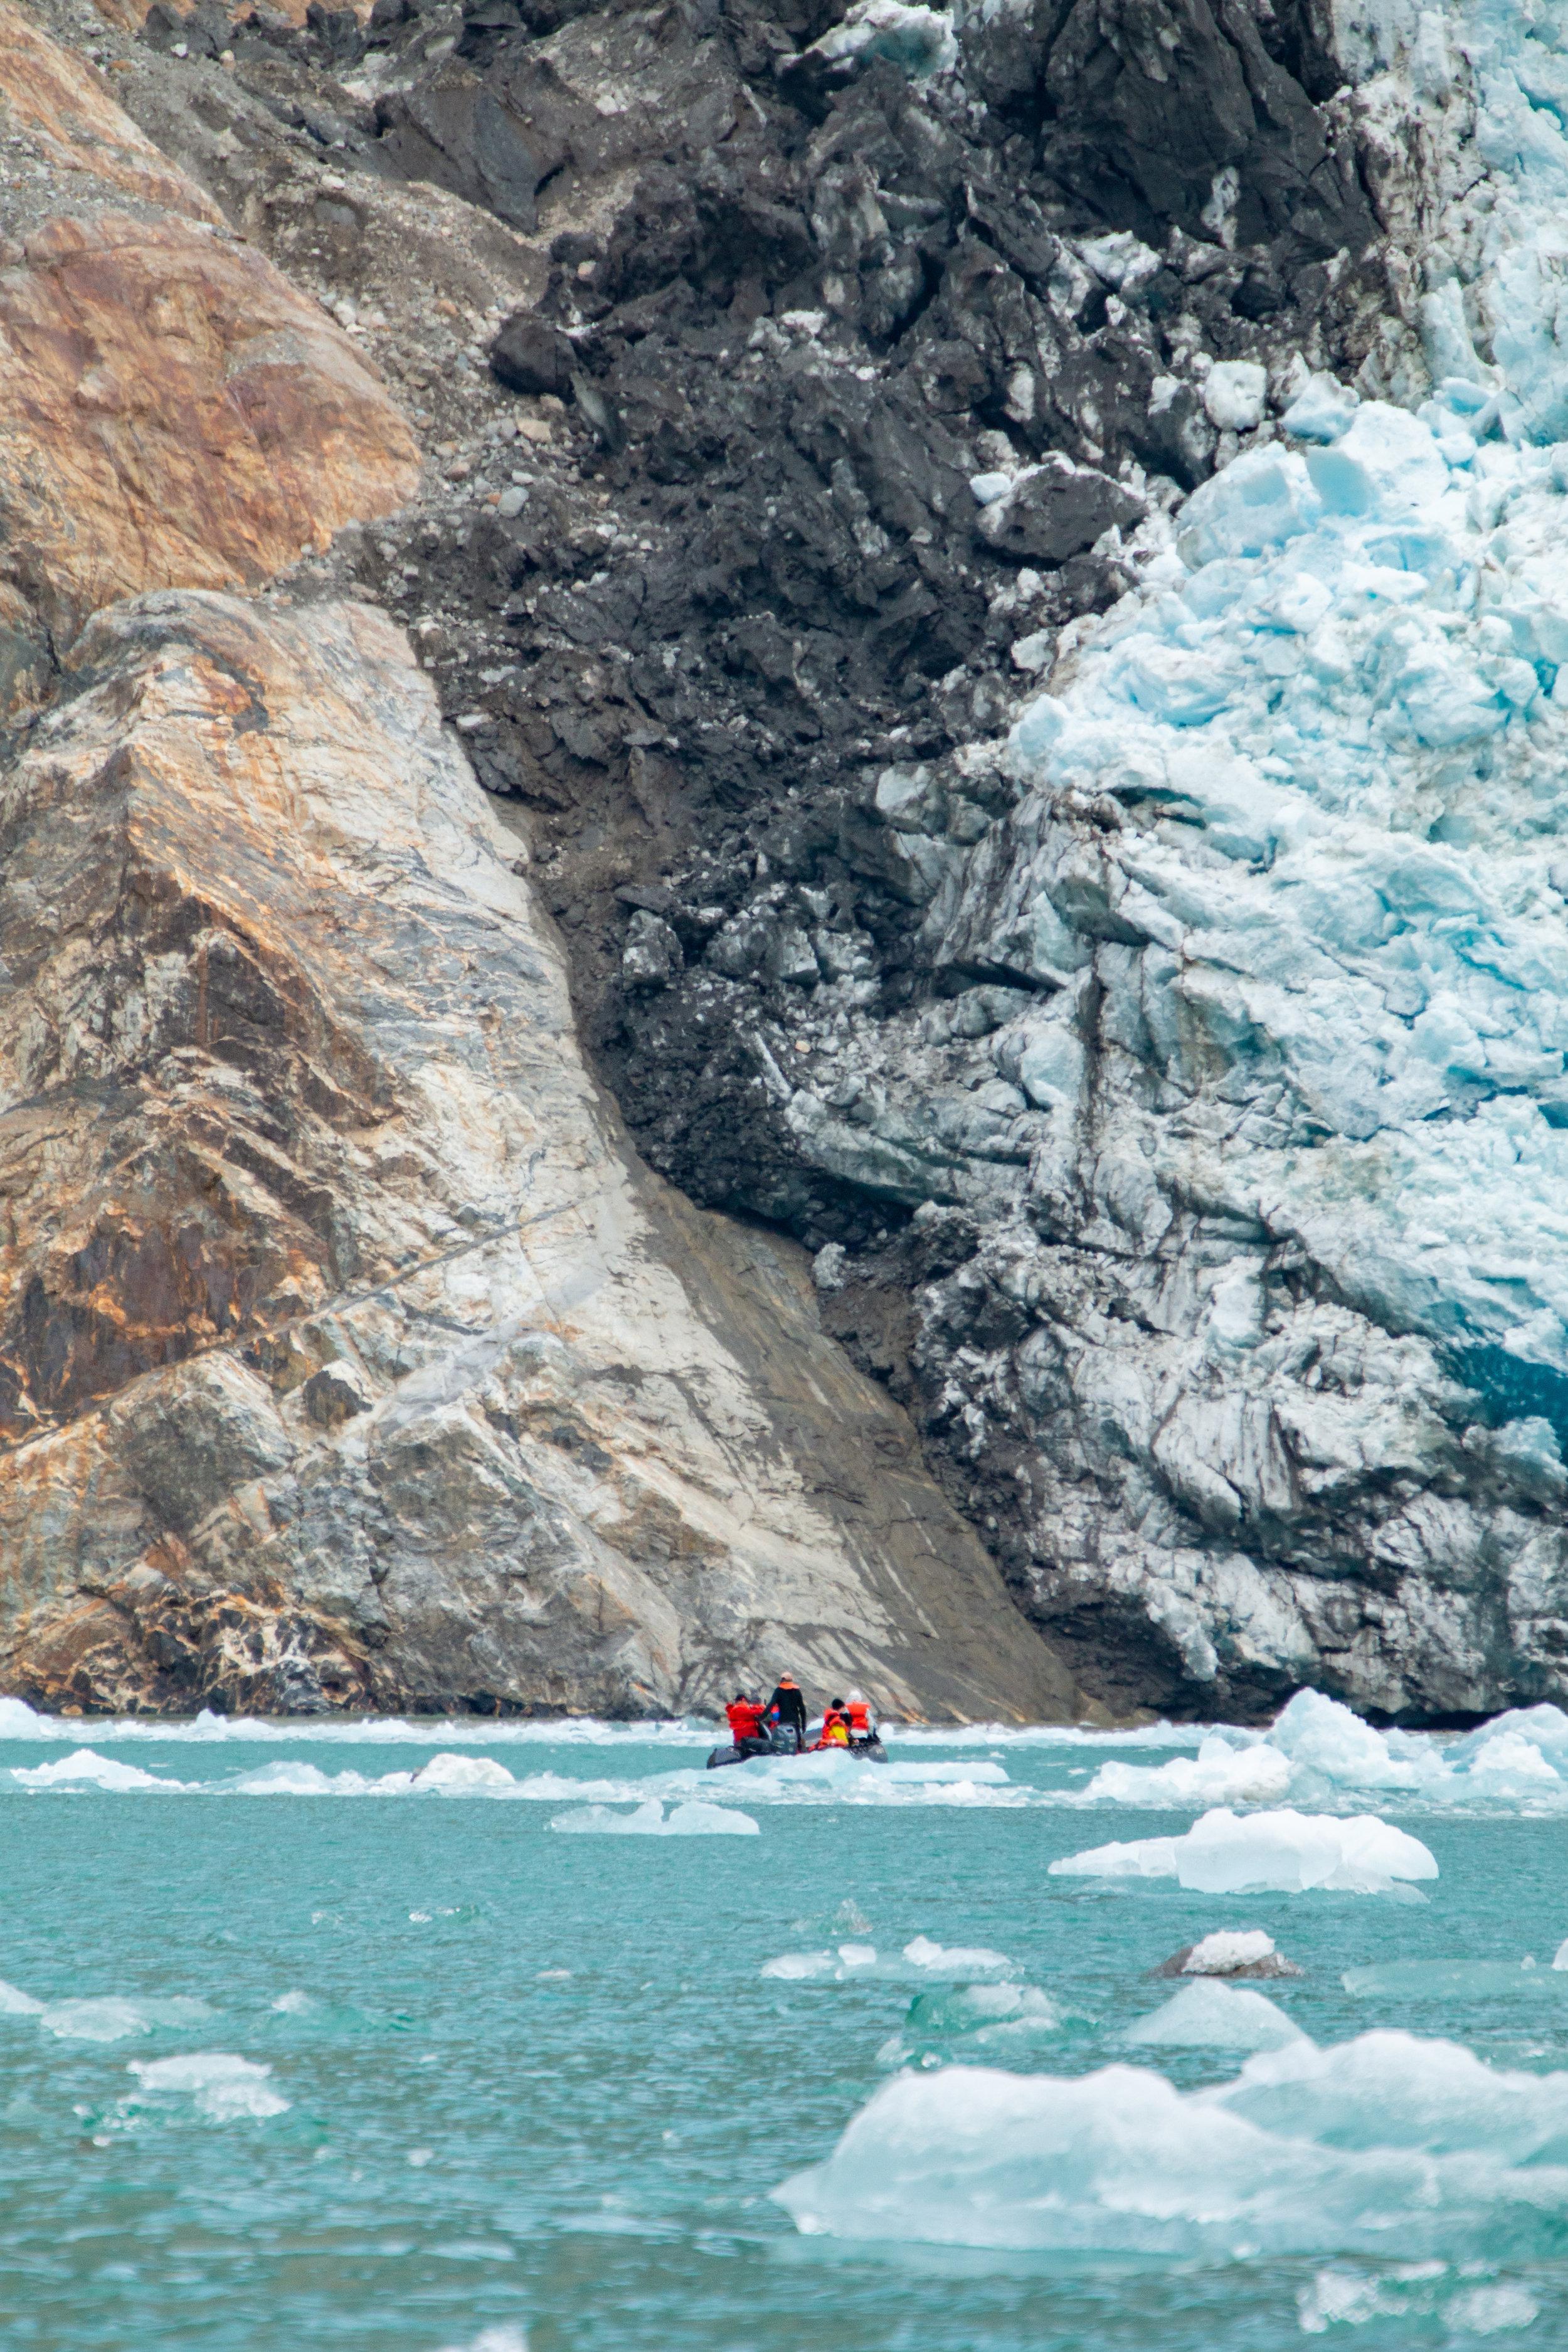 Zodiac approaching South Sawyer Glacier, Tracy-Arm Ford, Southeast Alaska.